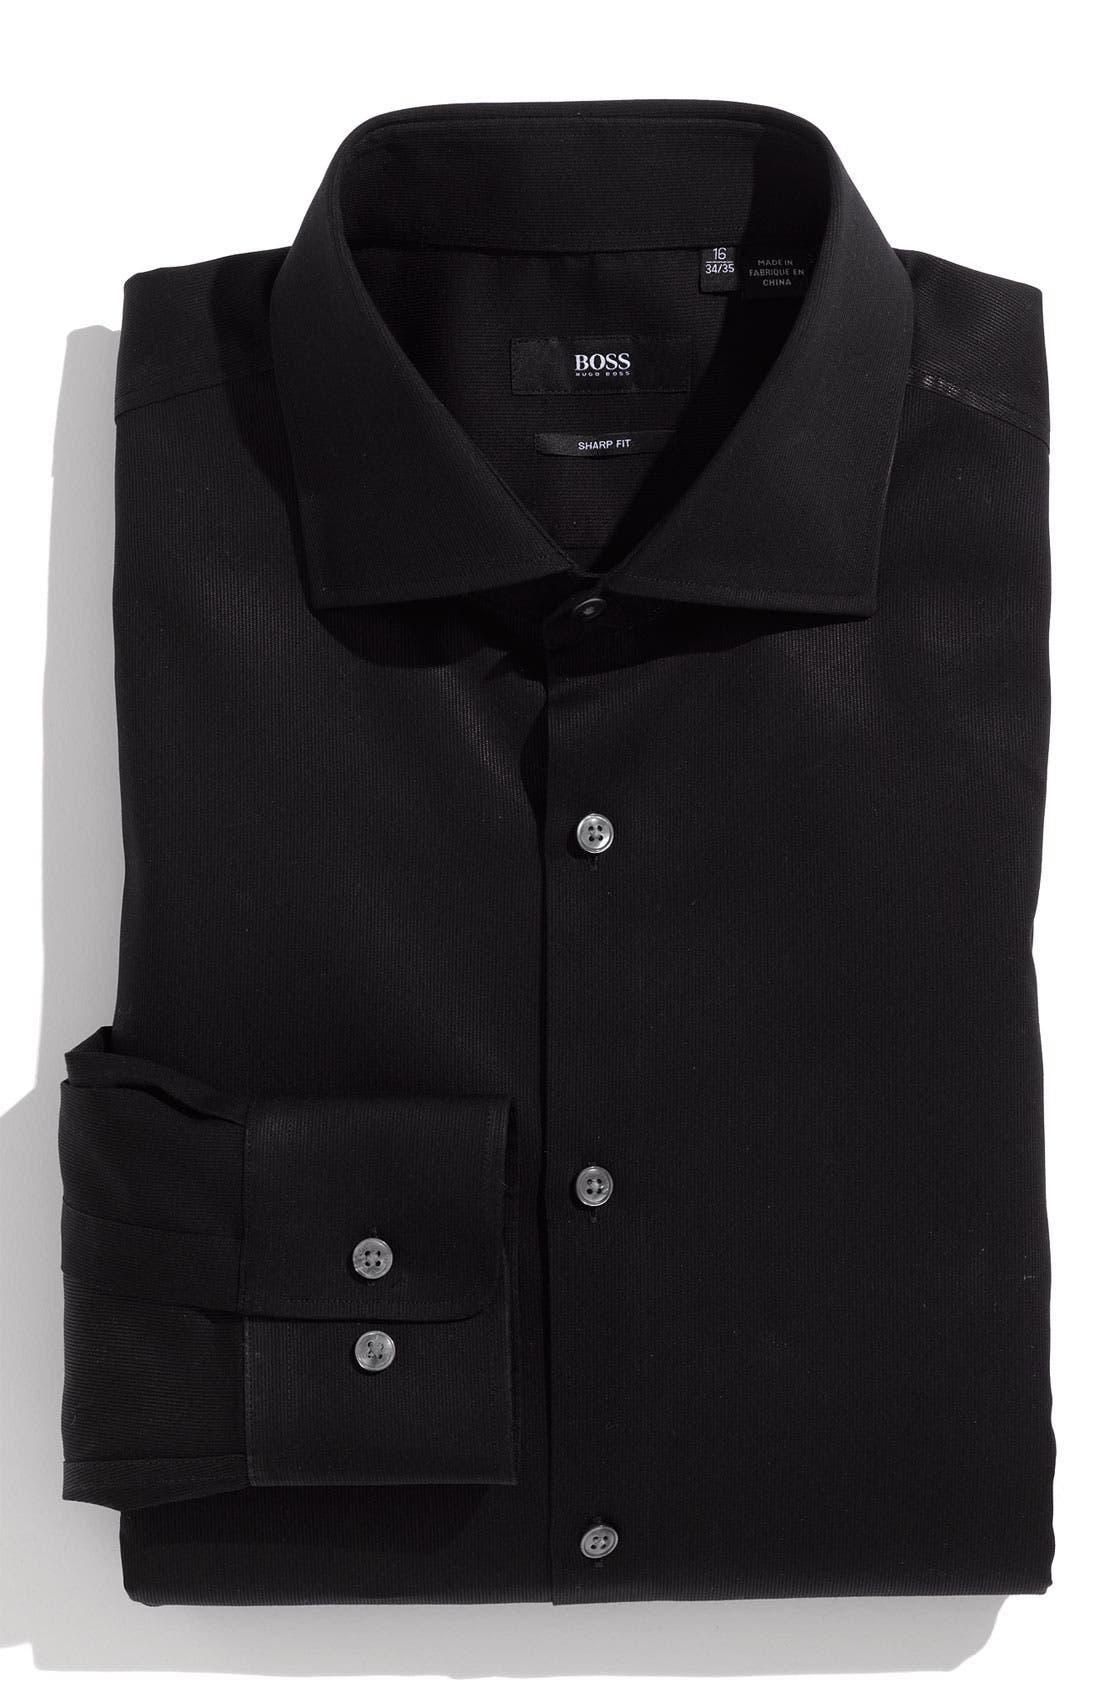 Main Image - BOSS HUGO BOSS 'Miles' Sharp Fit Tonal Stripe Cotton Dress Shirt